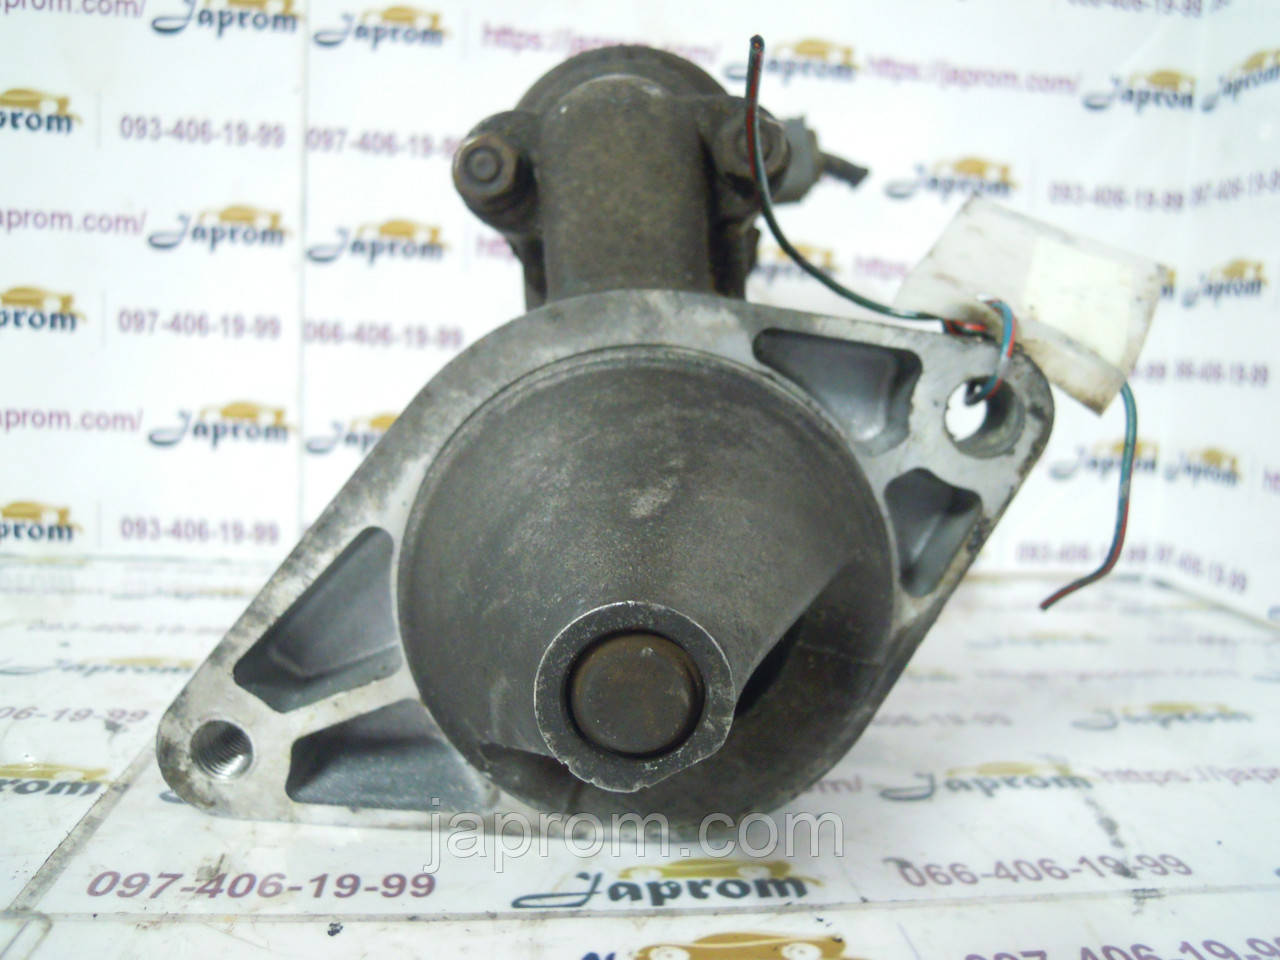 Стартер Toyota Yaris Echo 1999-2005 г.в.1.0 1.3 бензин